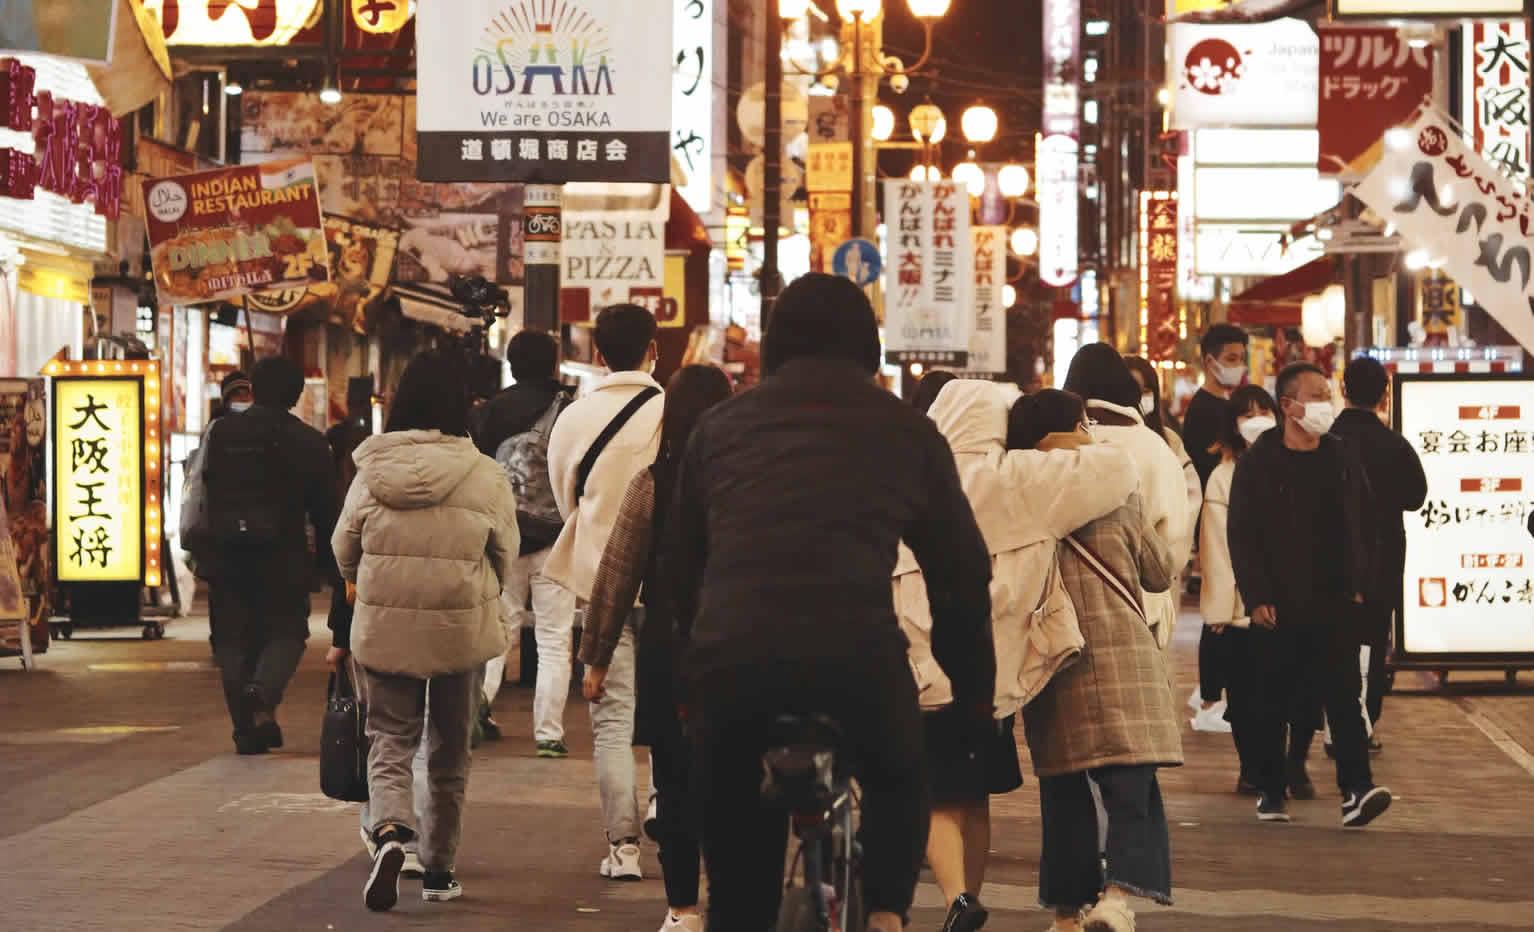 Tokyo Enacts 'Quasi-emergency' Order to Curb COVID-19 Spread Ahead of Olympics